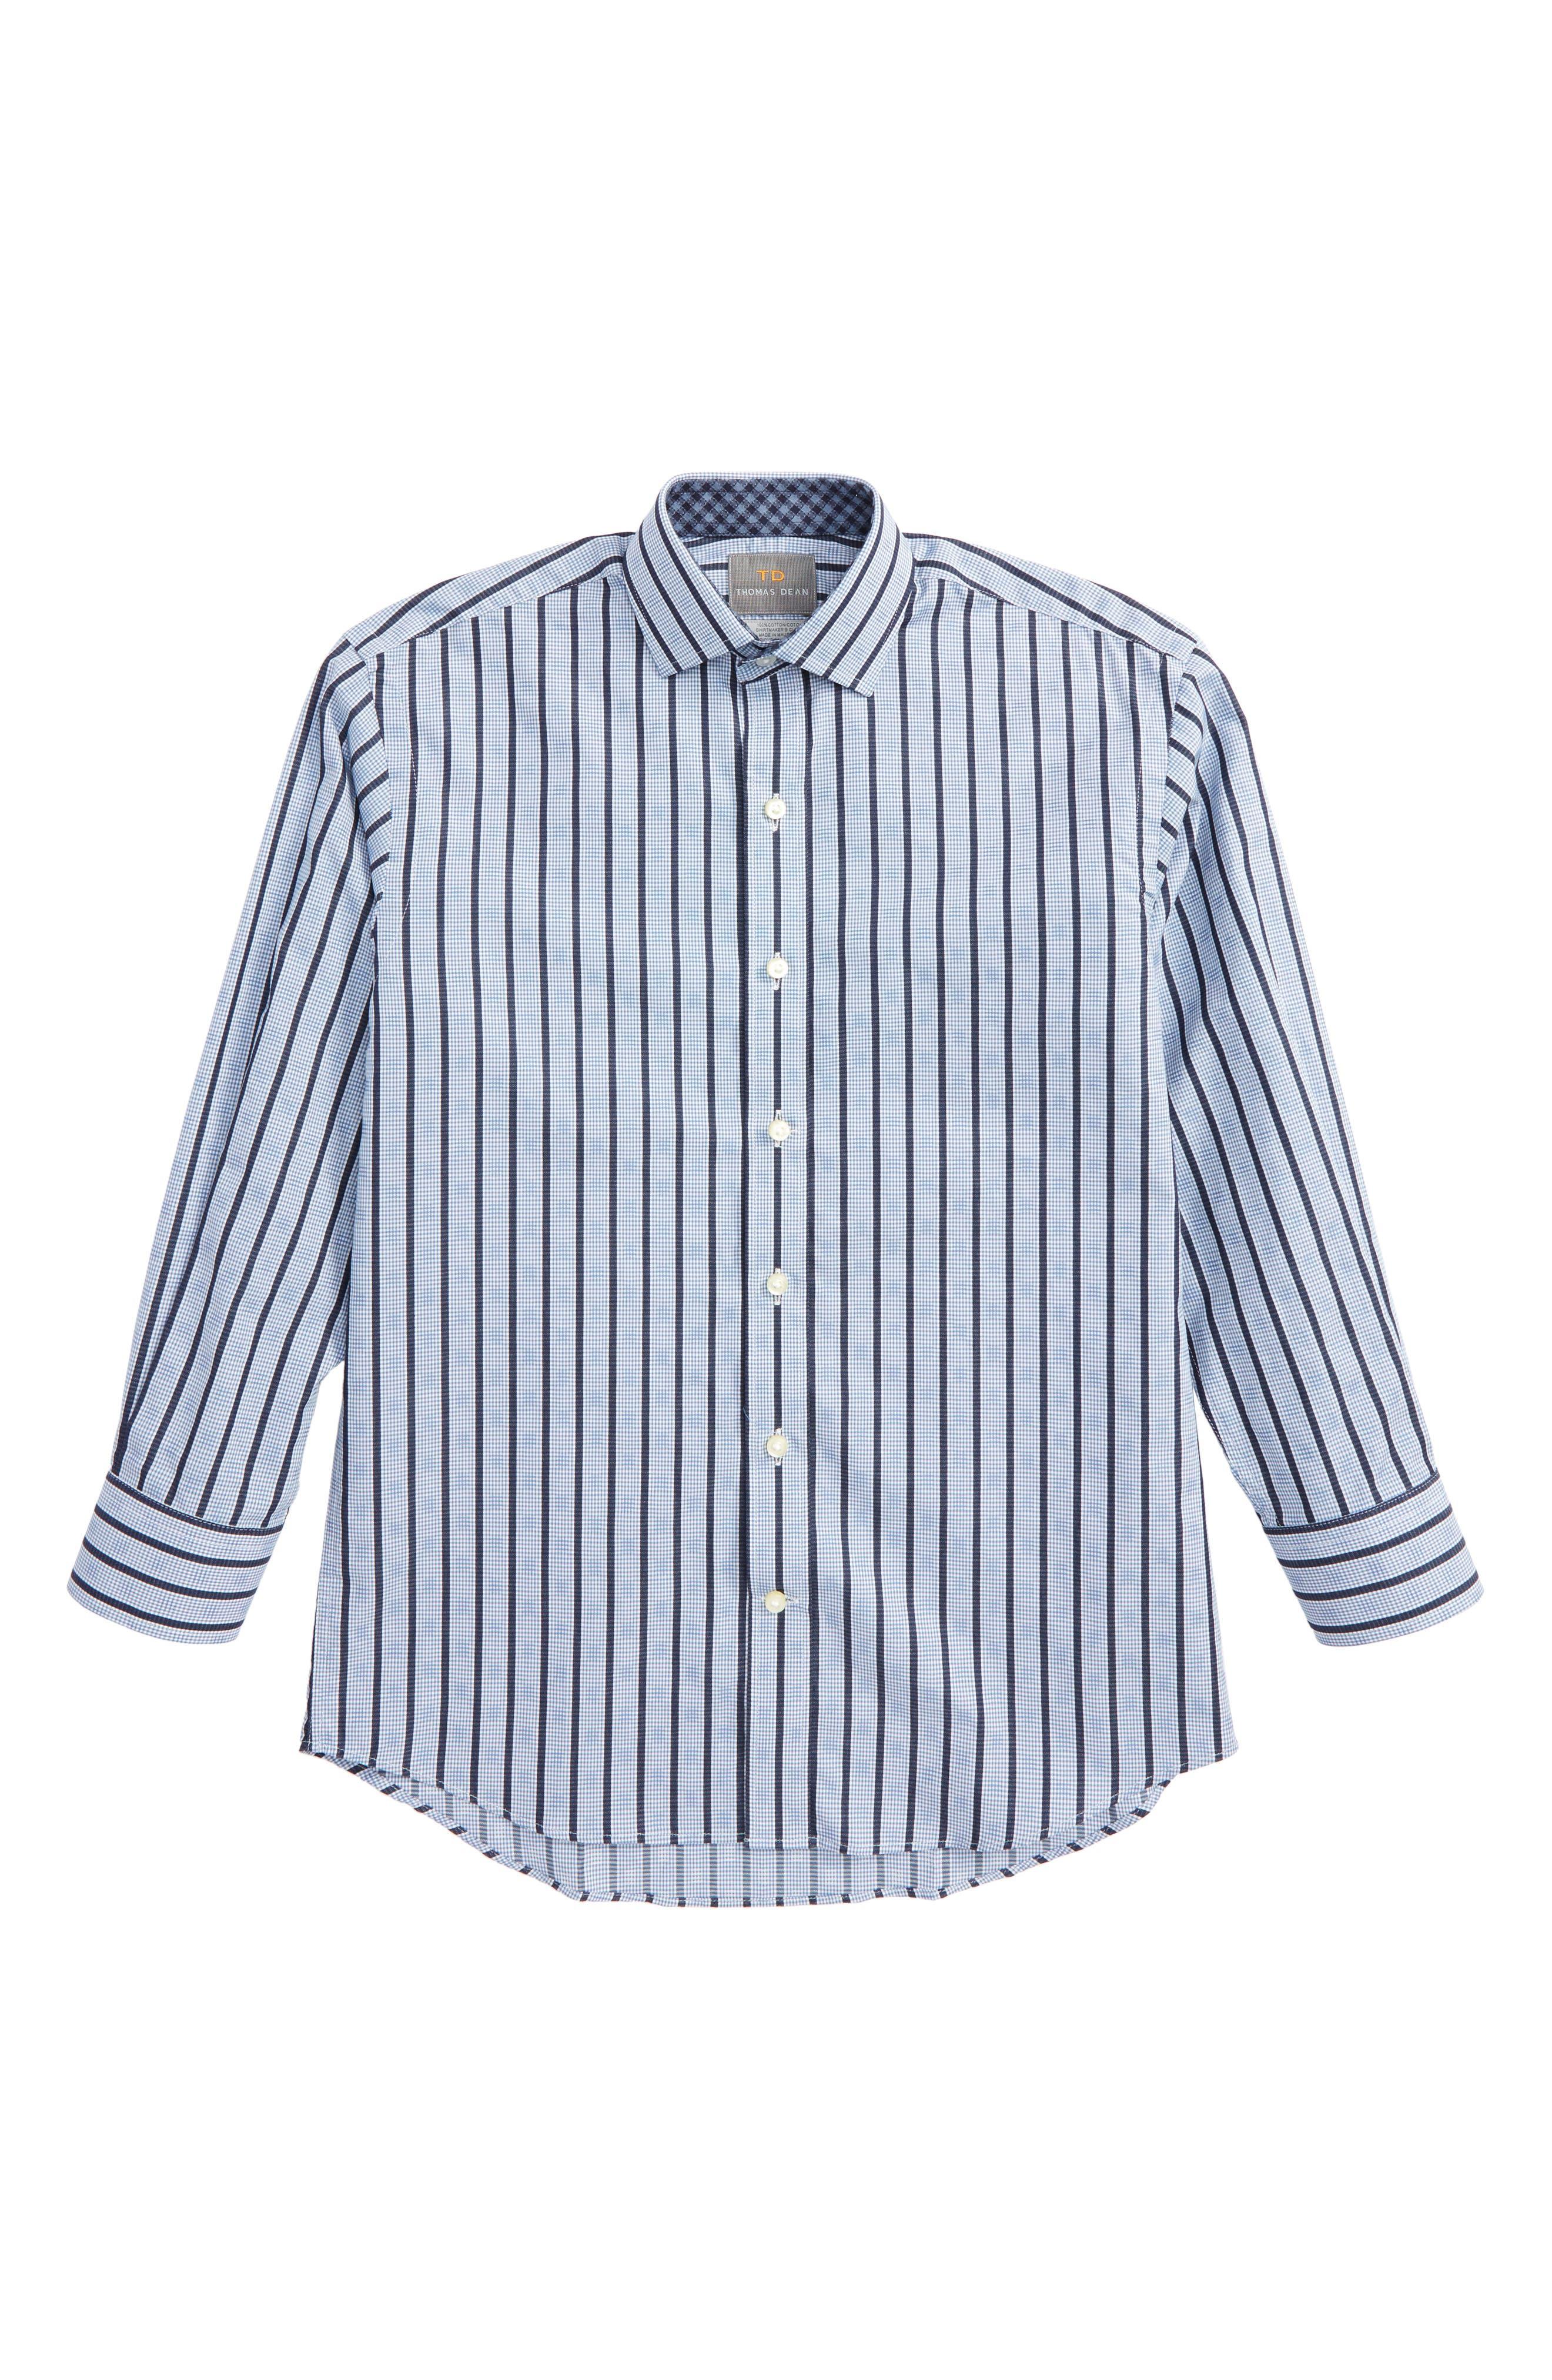 Alternate Image 1 Selected - Thomas Dean Stripe & Check Dress Shirt (Big Boys)